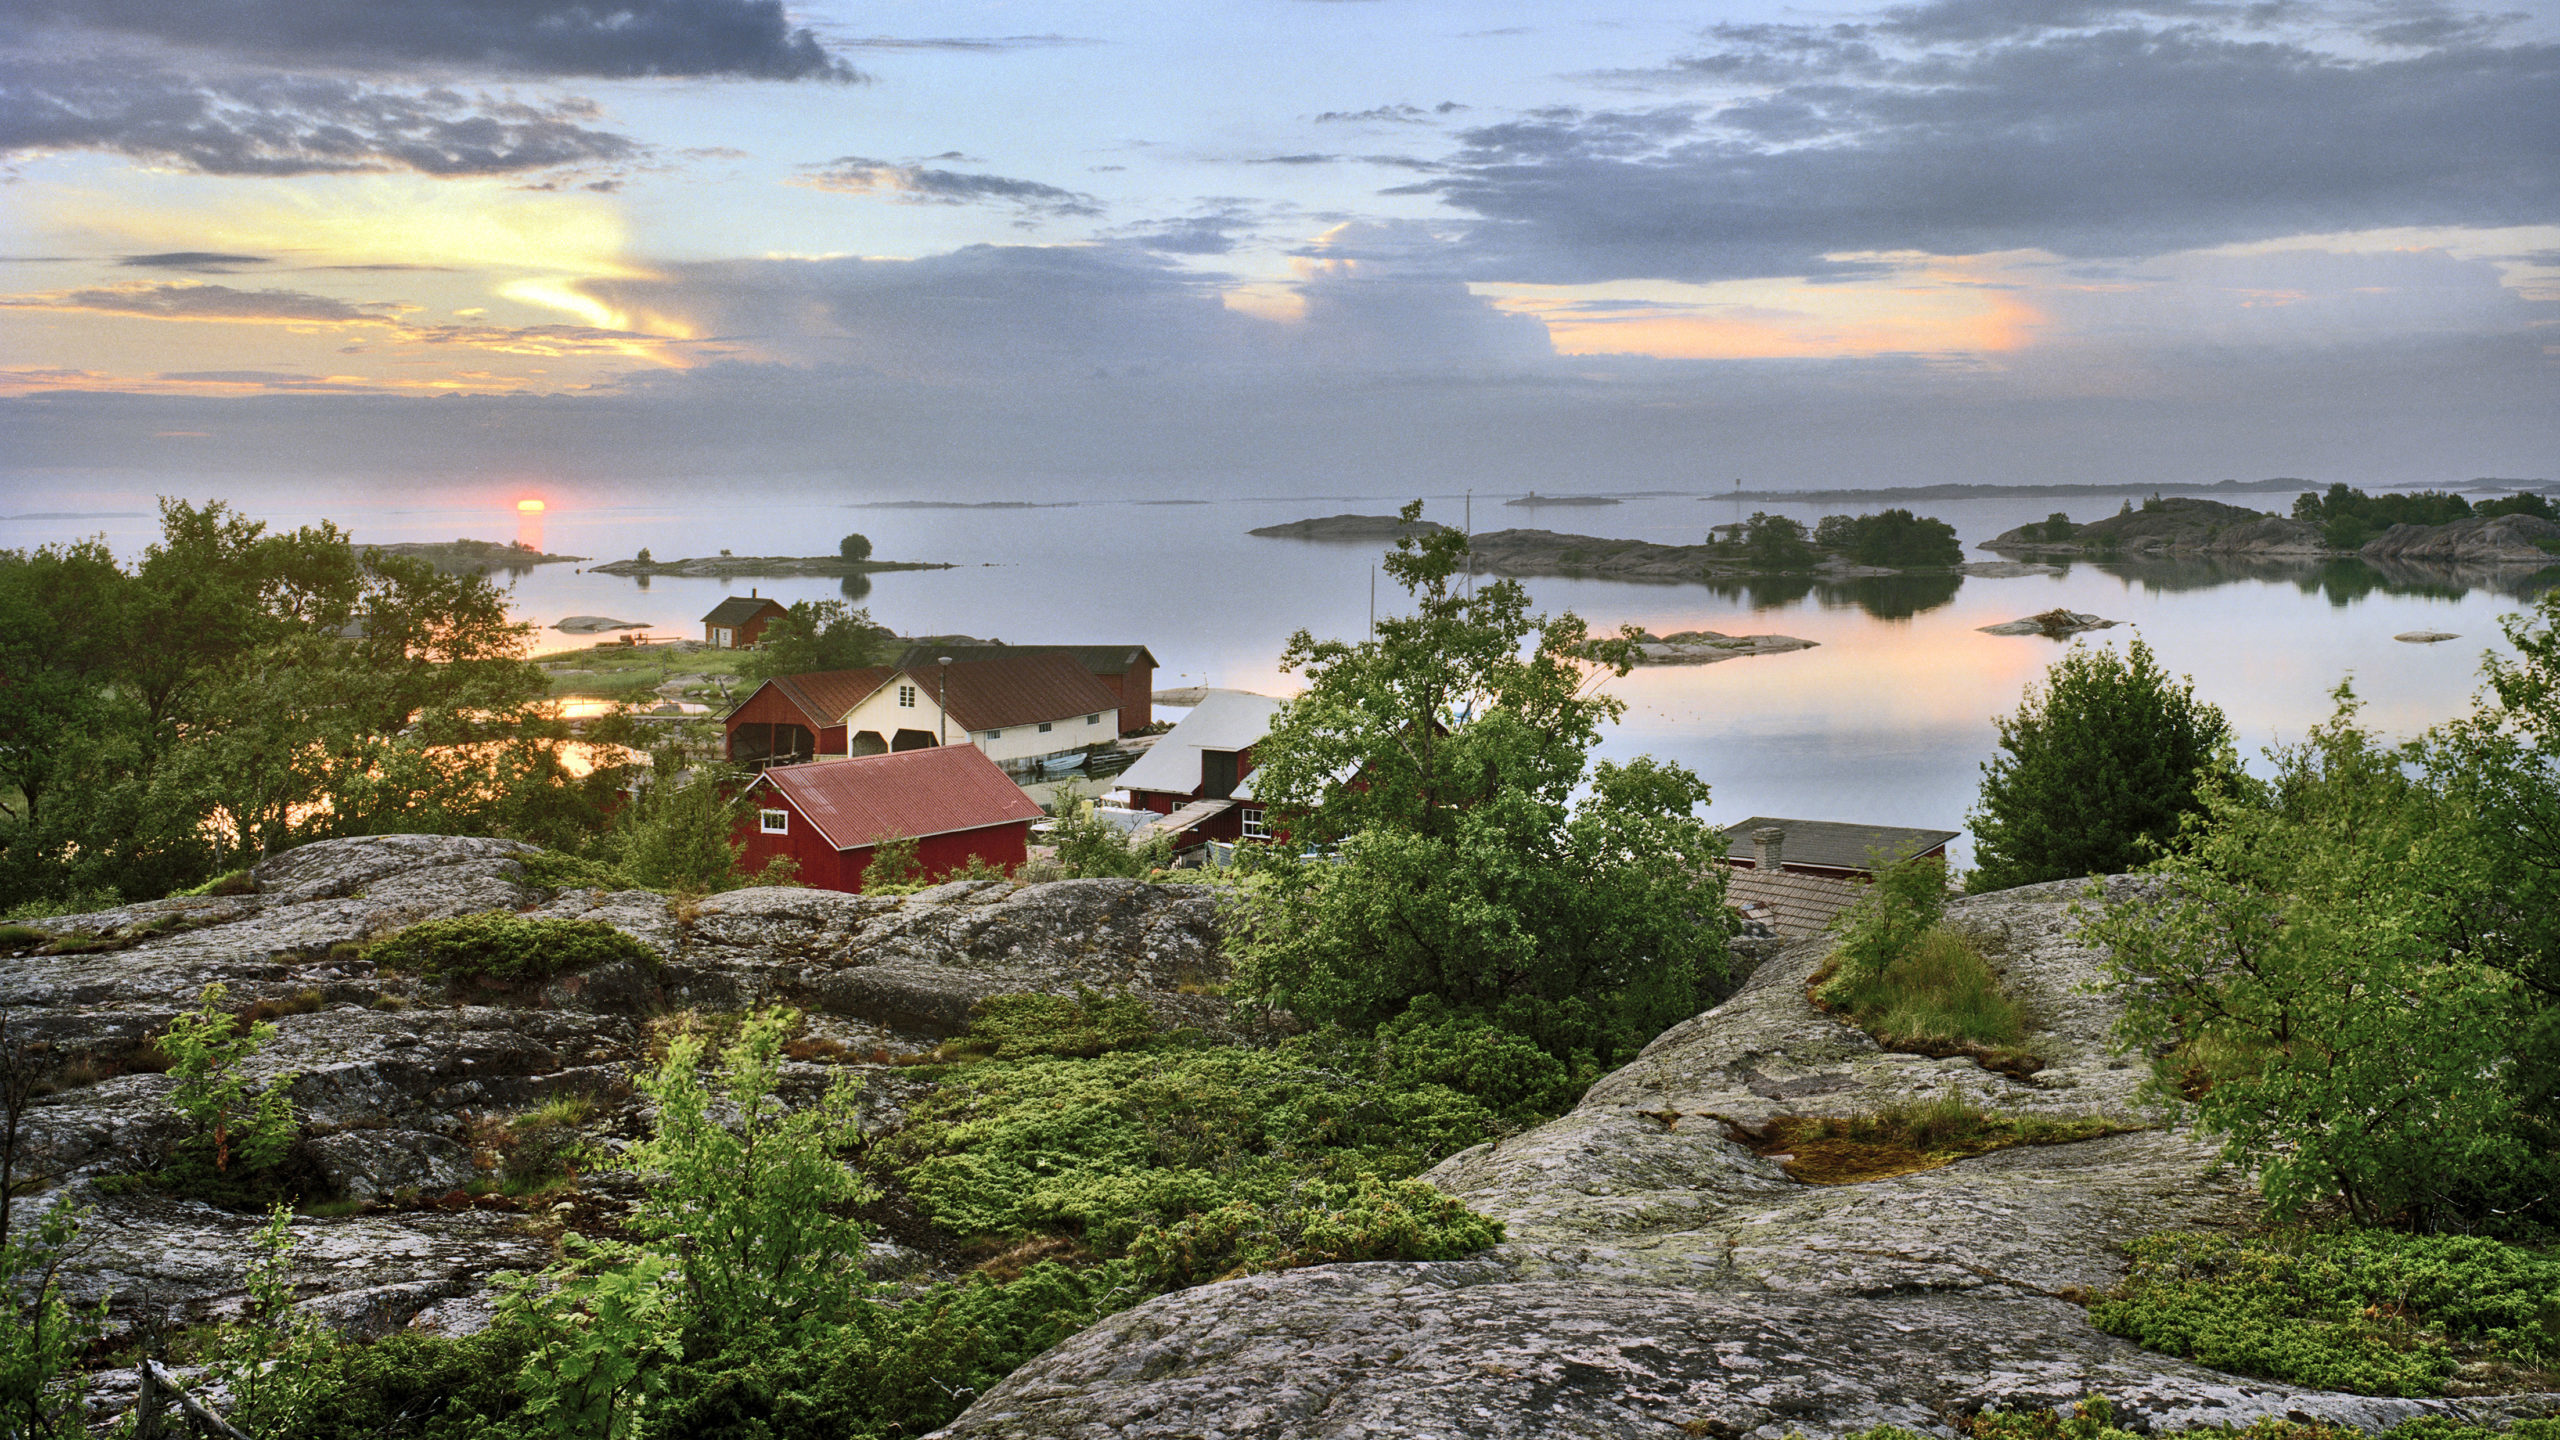 Pekka Turunen/Meren maa -Havets land